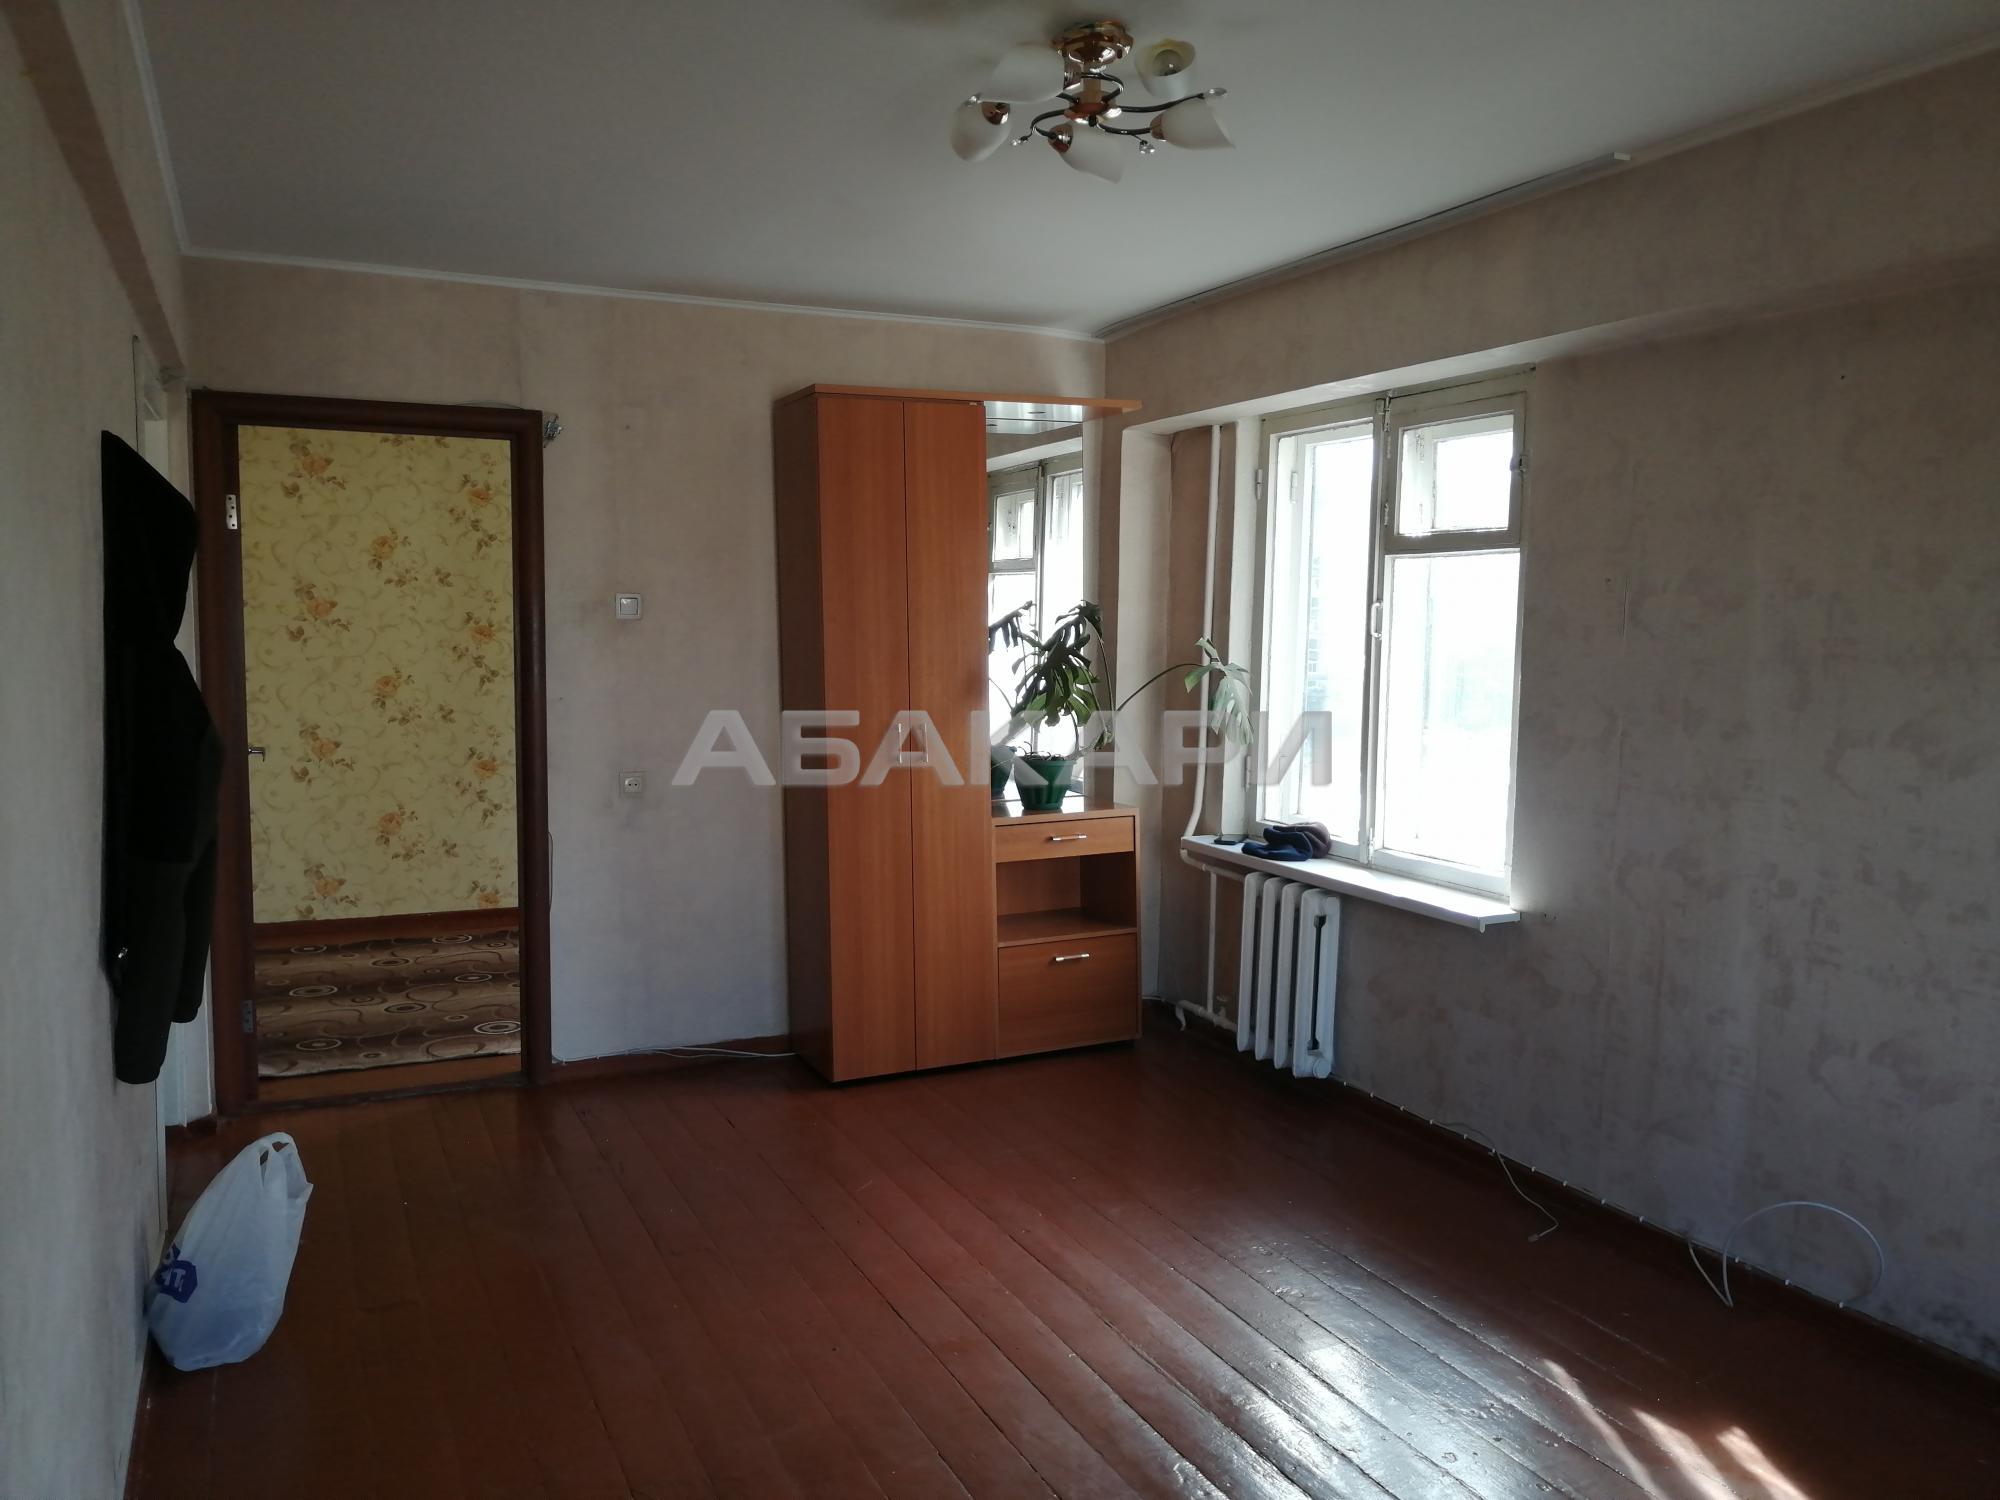 2к квартира Волжская улица, 5г 3/5 - 45кв | 13000 | аренда в Красноярске фото 0